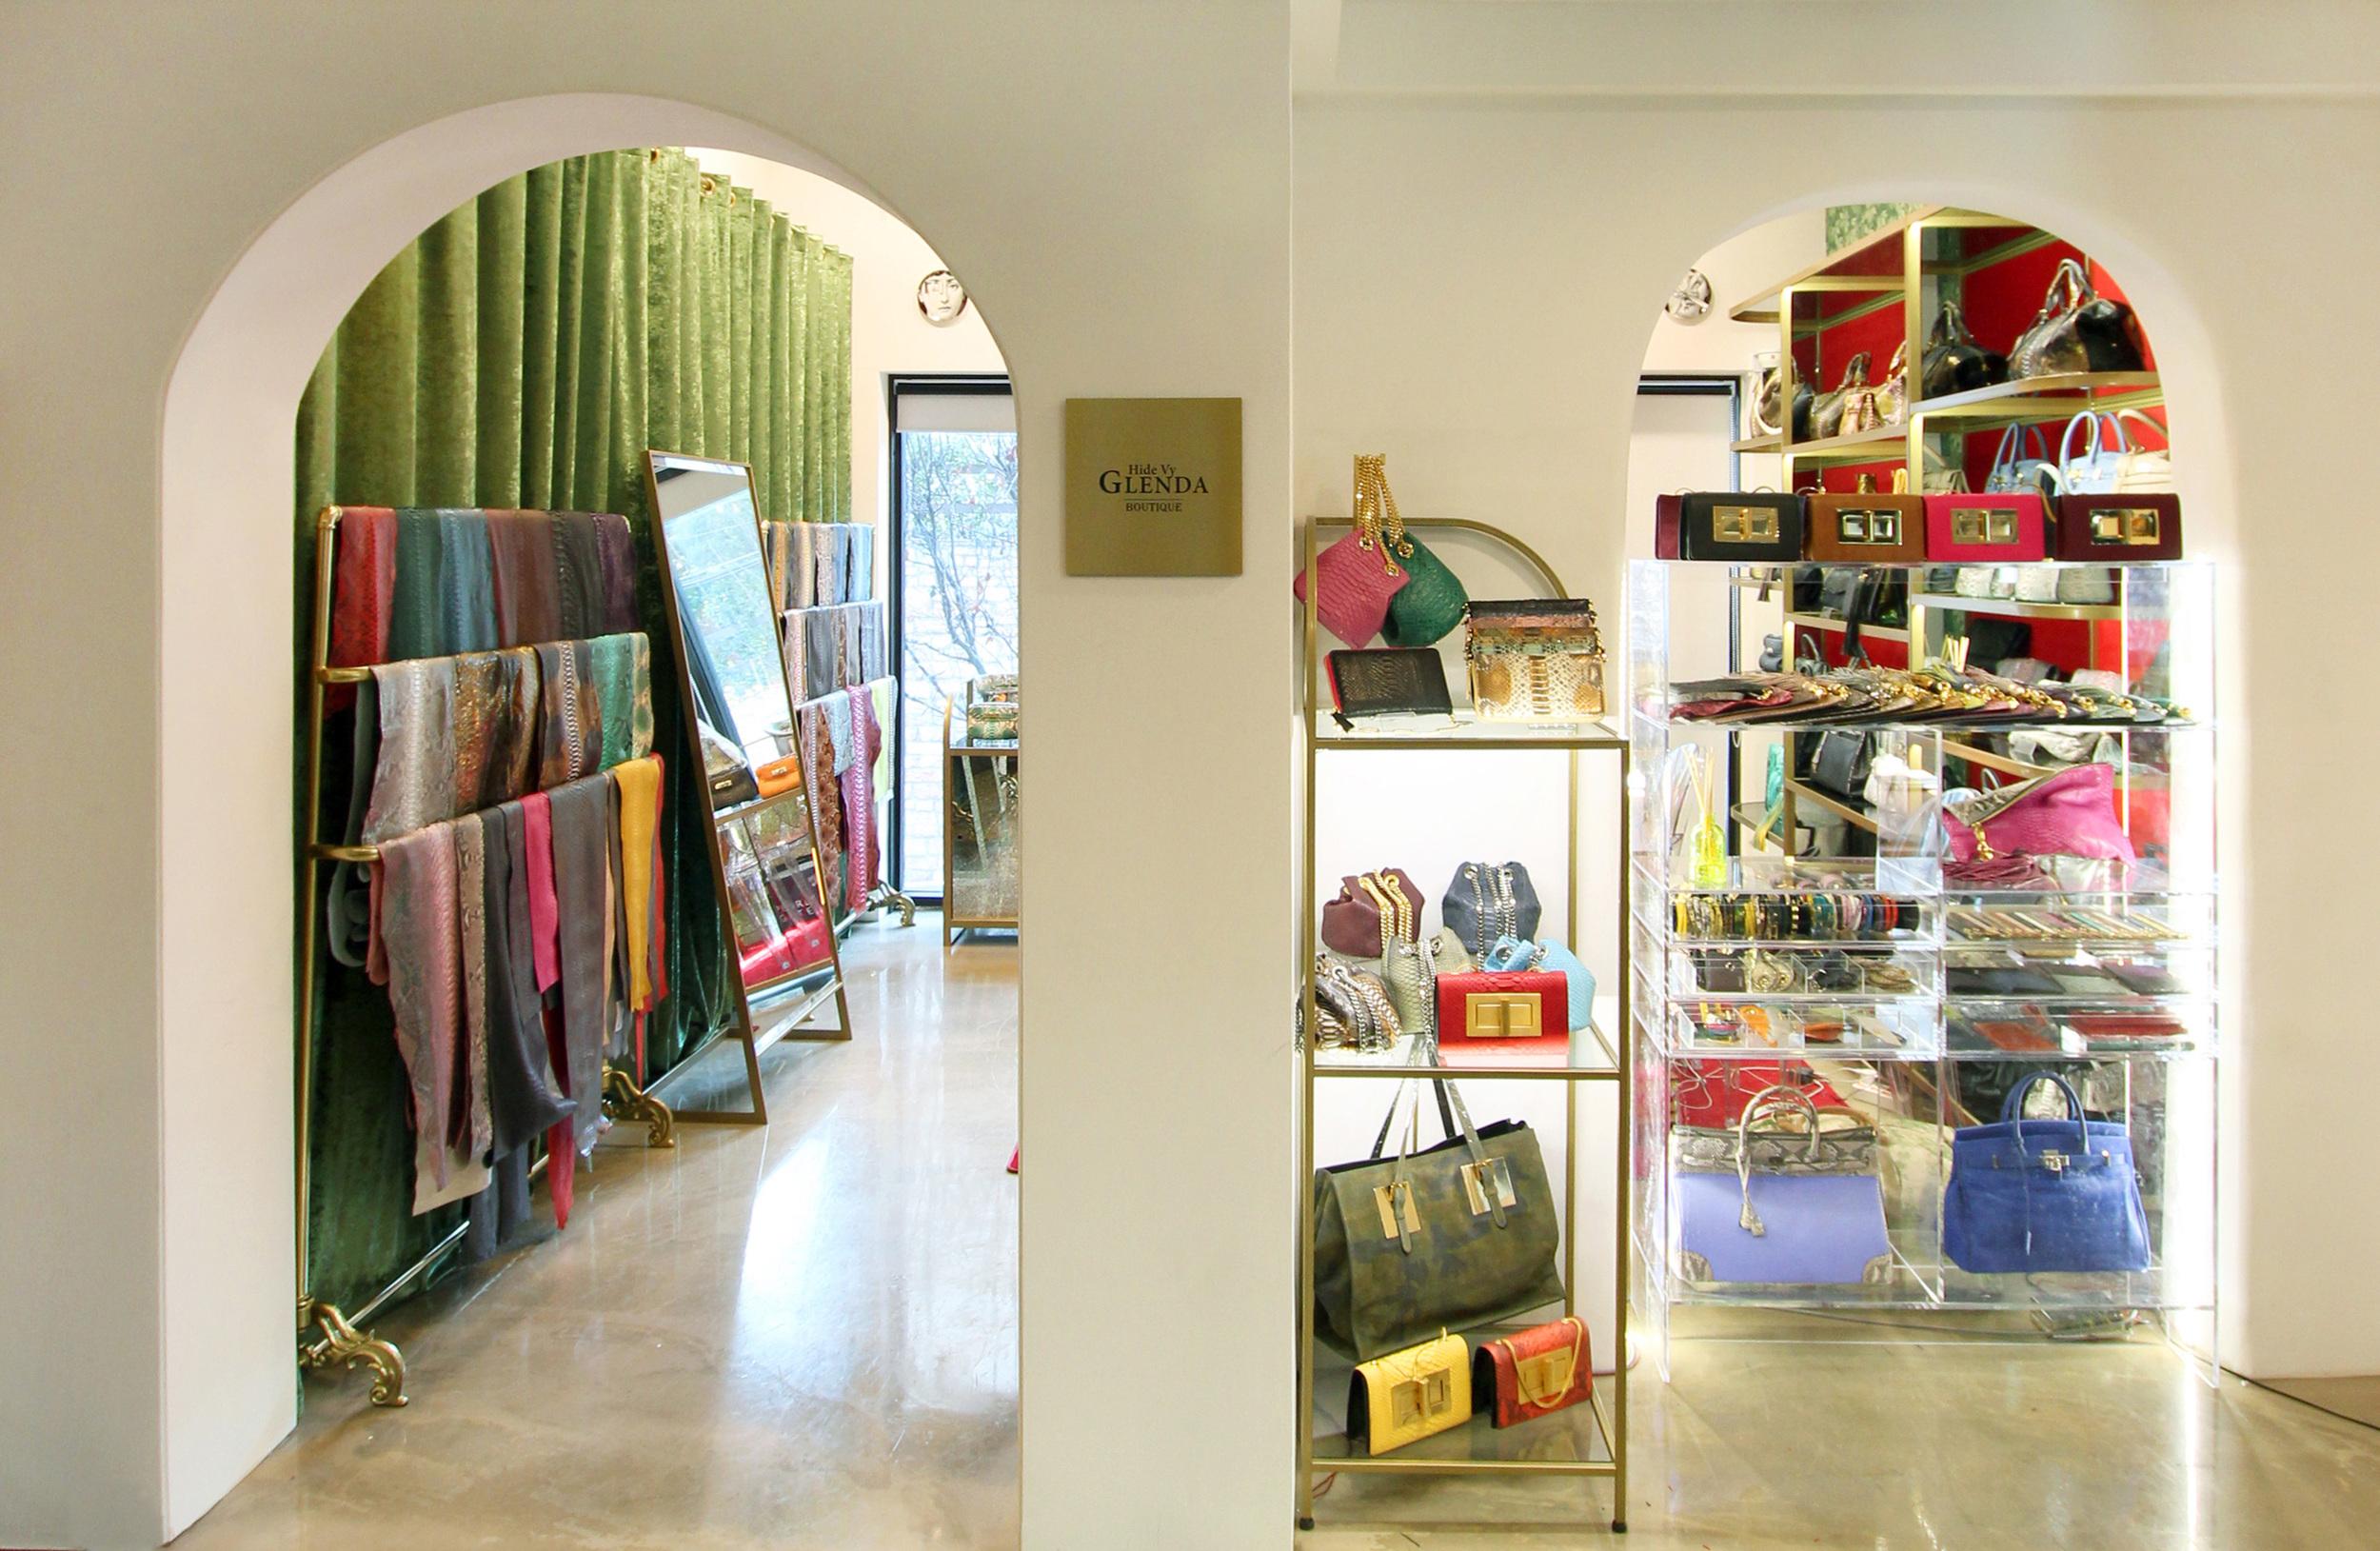 hjl studio - glenda boutique 02